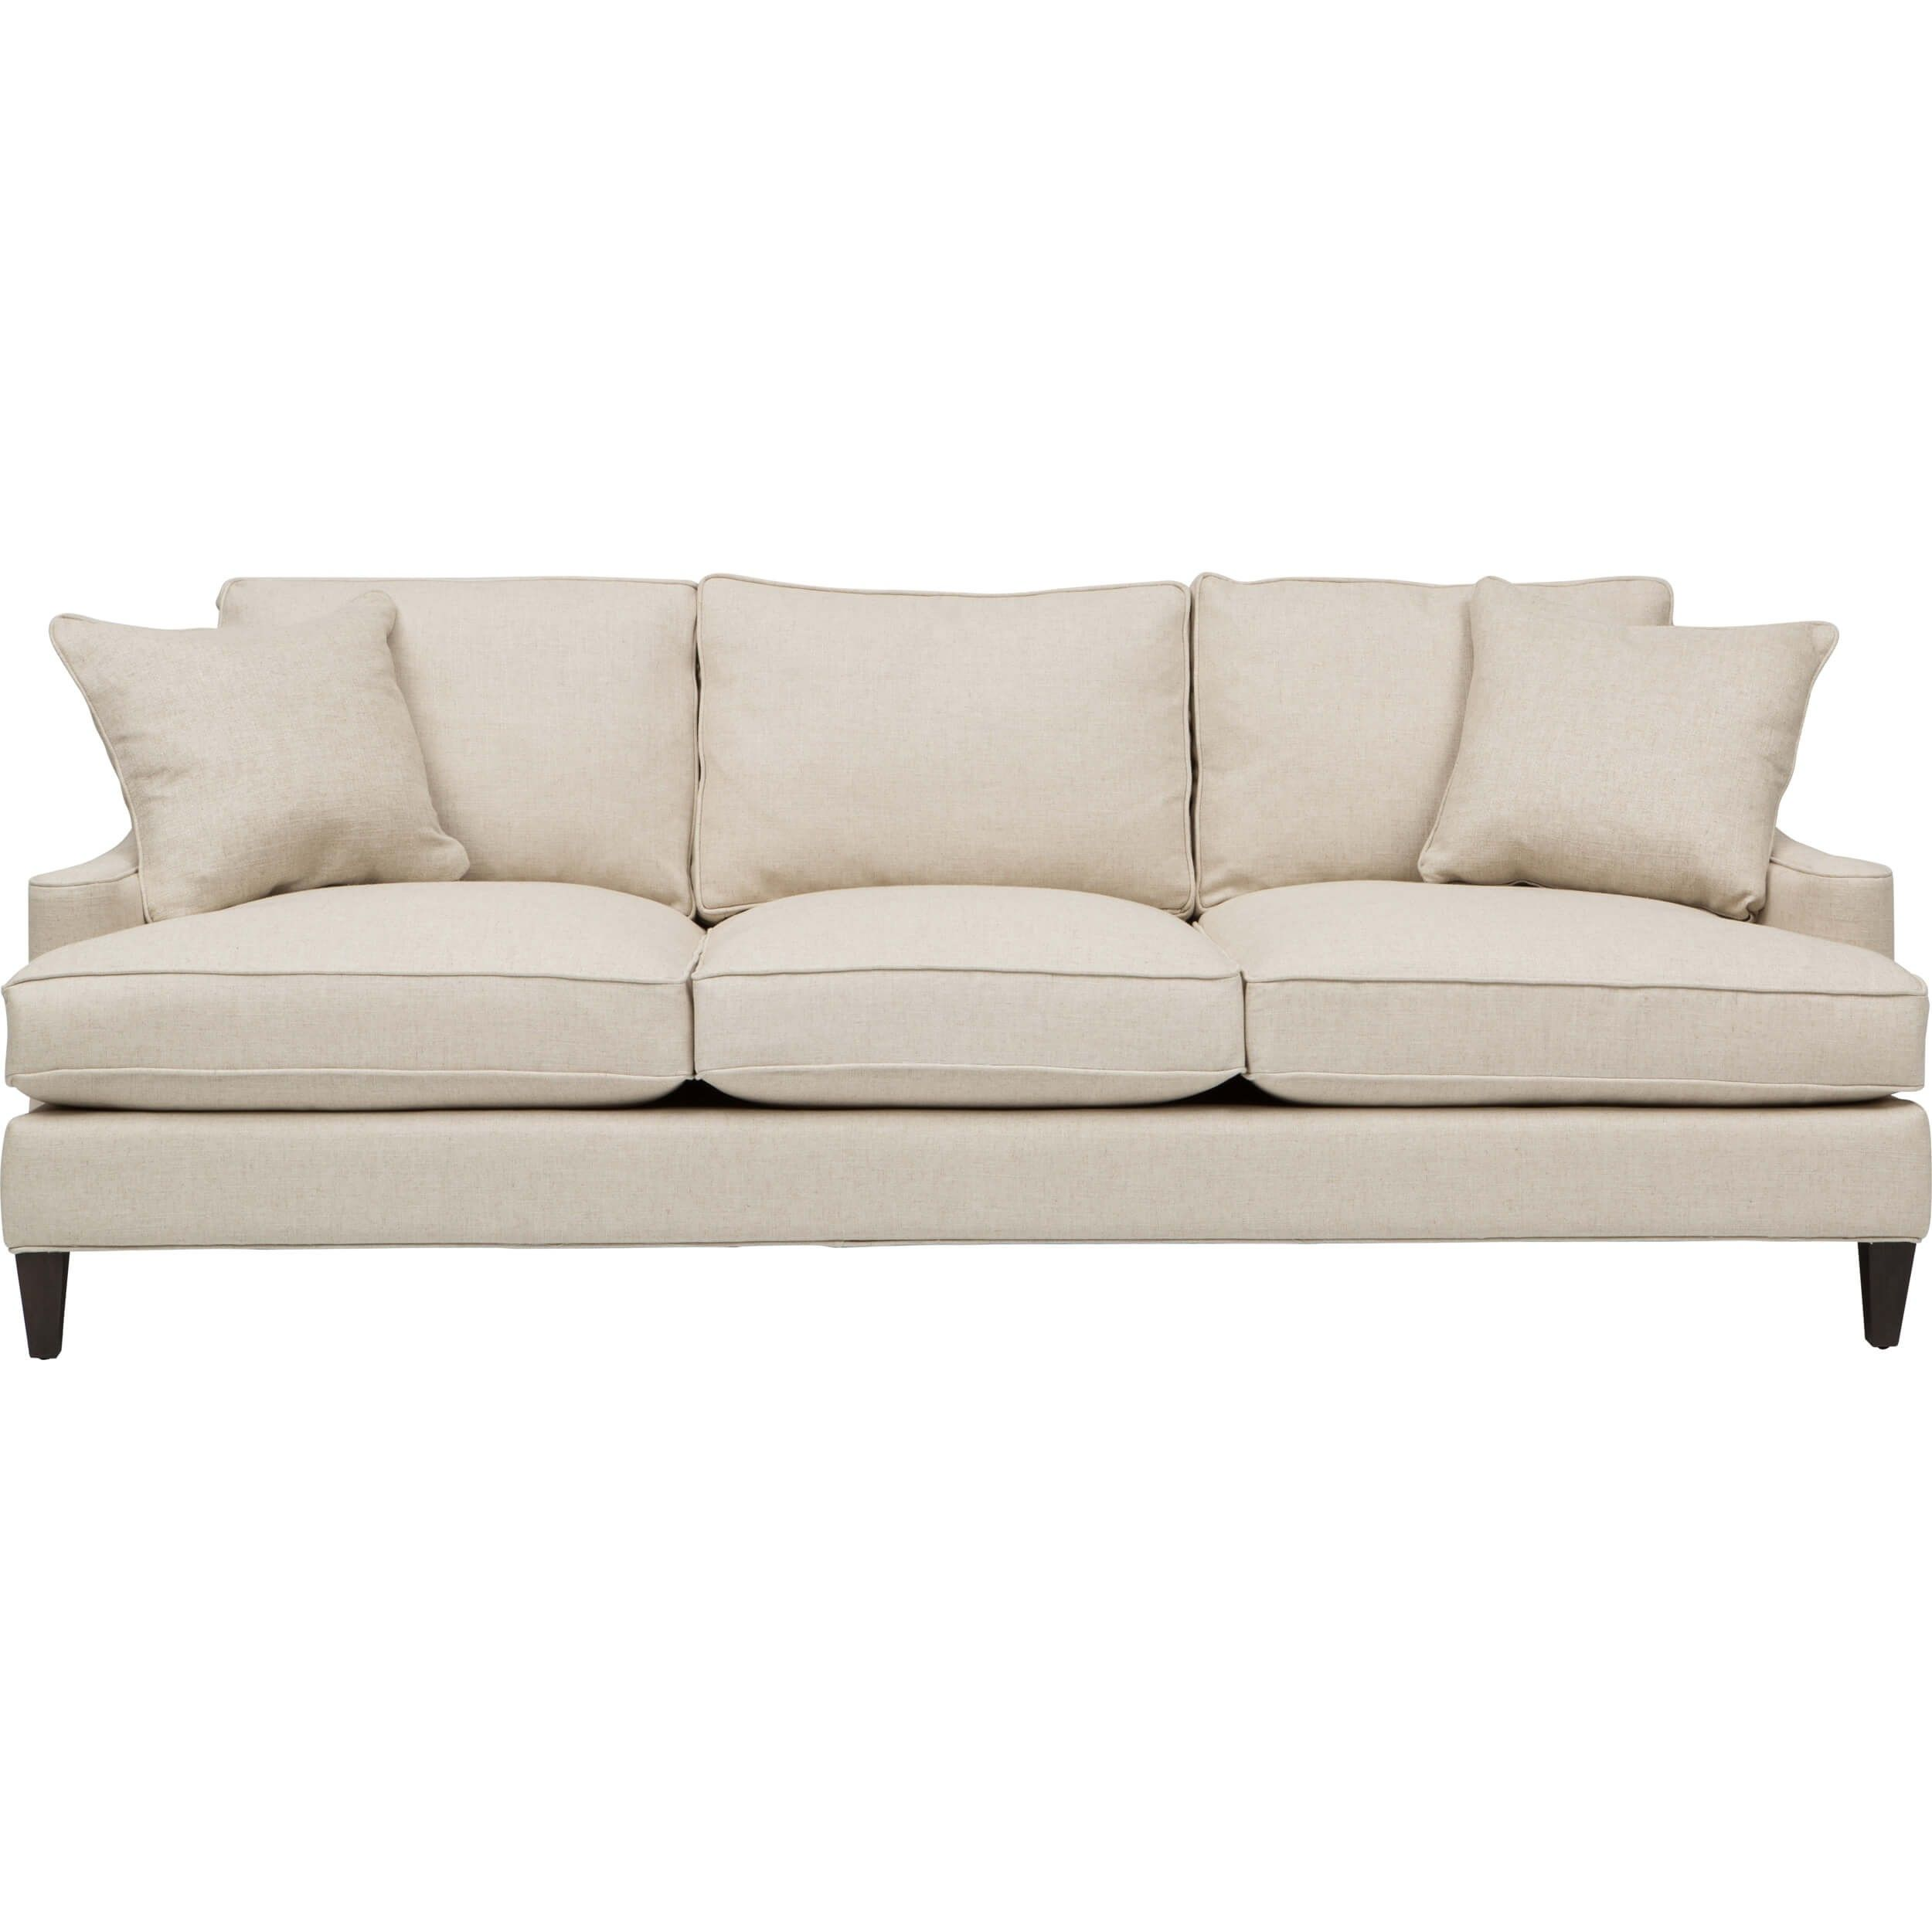 Jason Sofa Crevere Creme Fabric Sofas Furniture Sofa